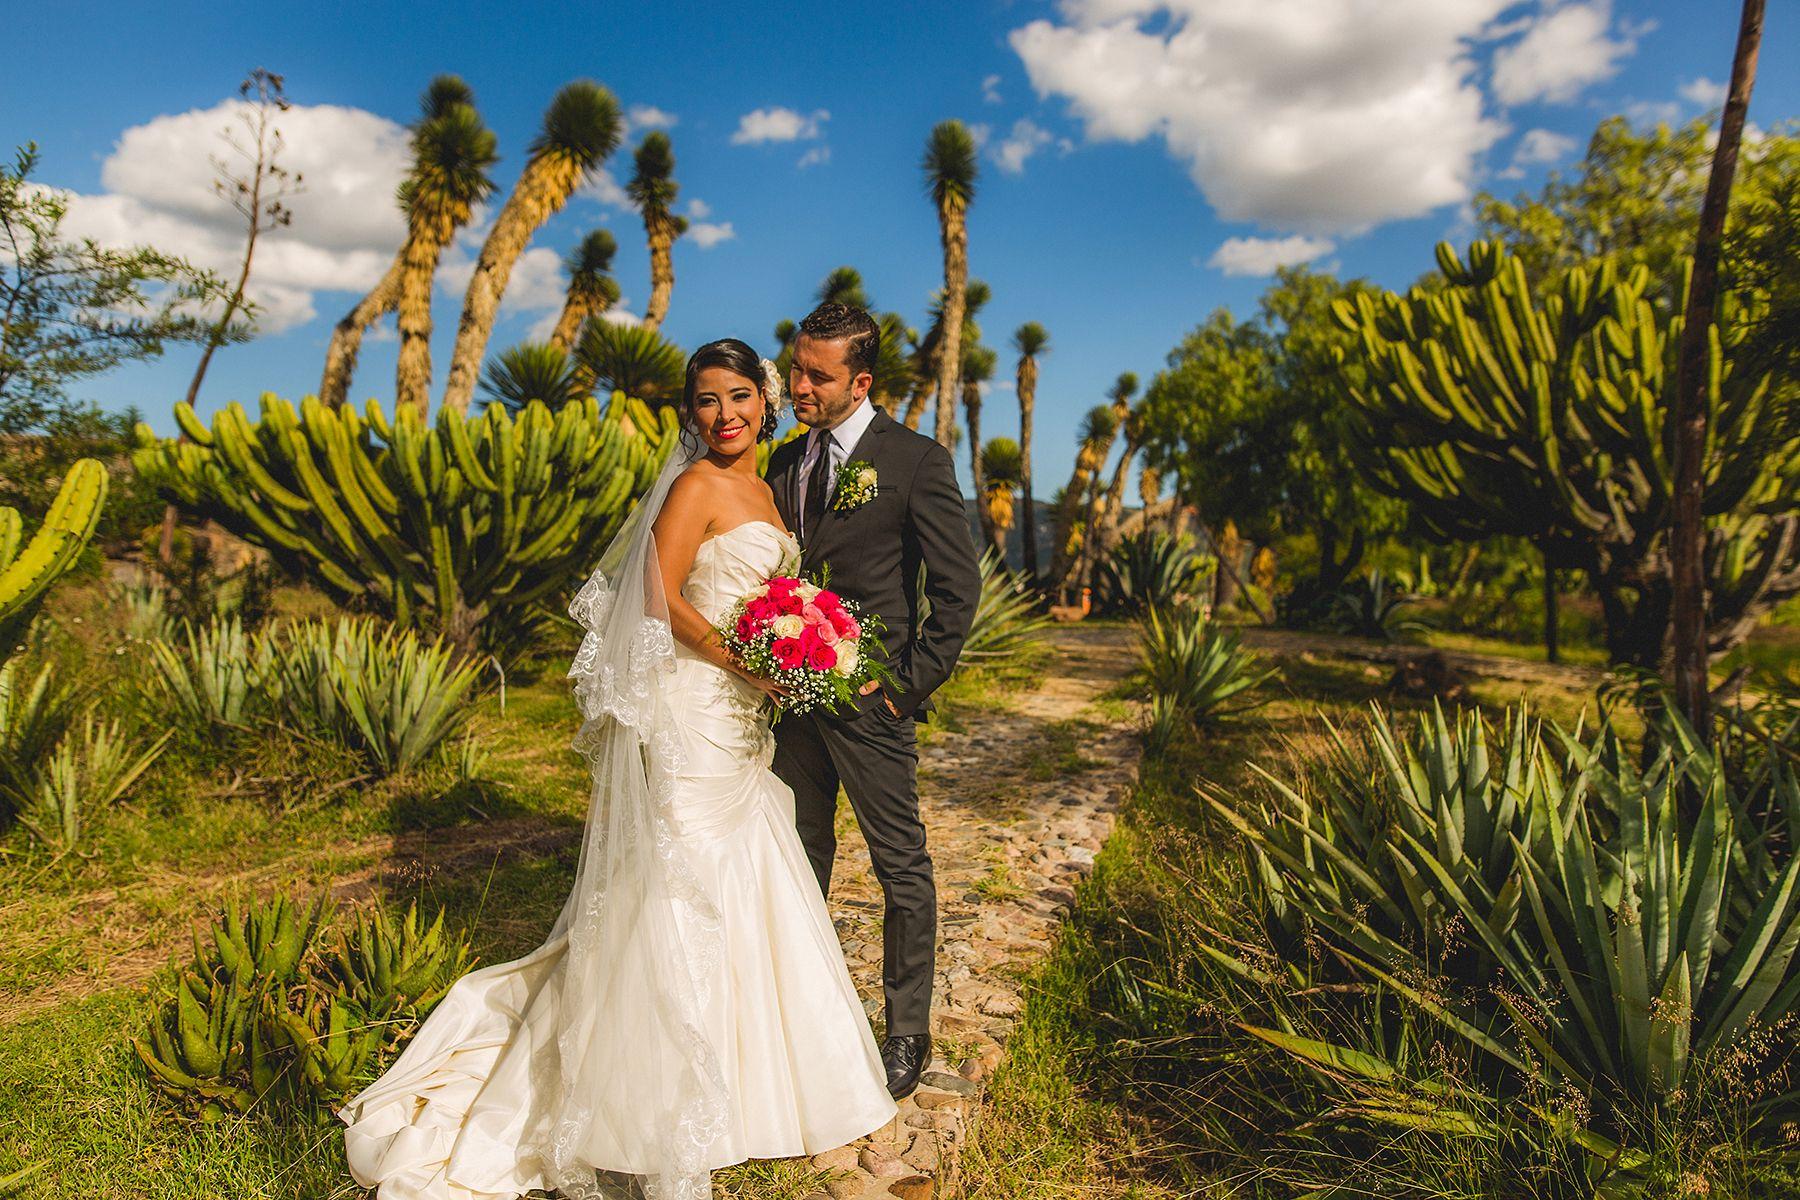 Hispanic Couple Mexico Destination Wedding Christian